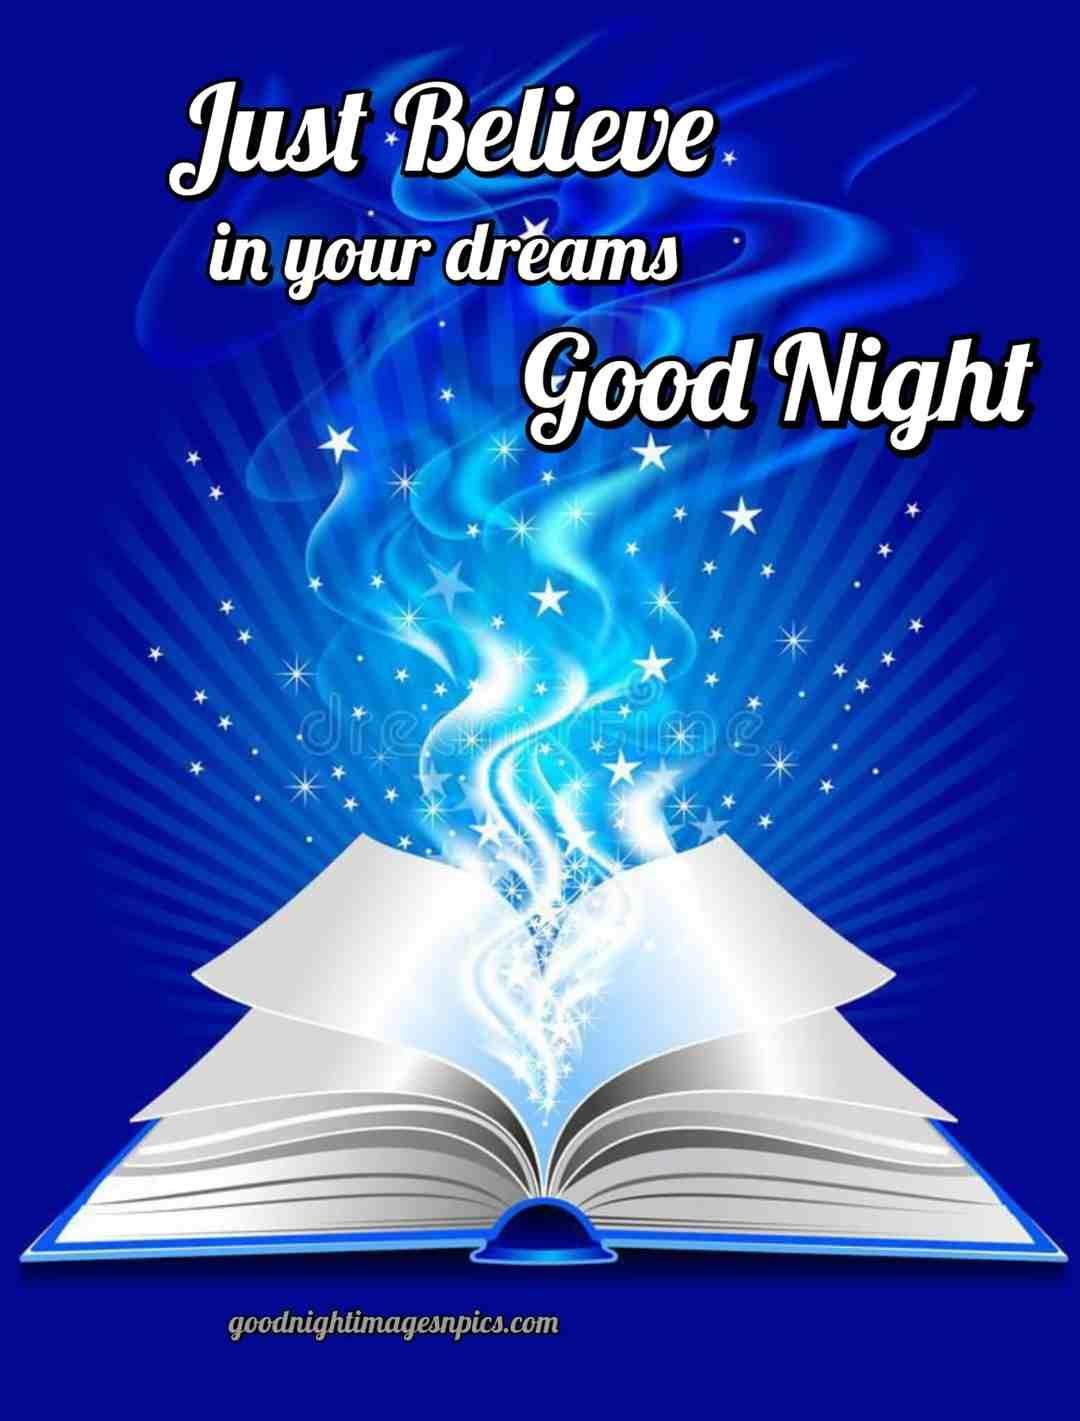 Good Night Gif Images For Whatsapp Good Night Gif Good Night Love Images Good Night Wishes